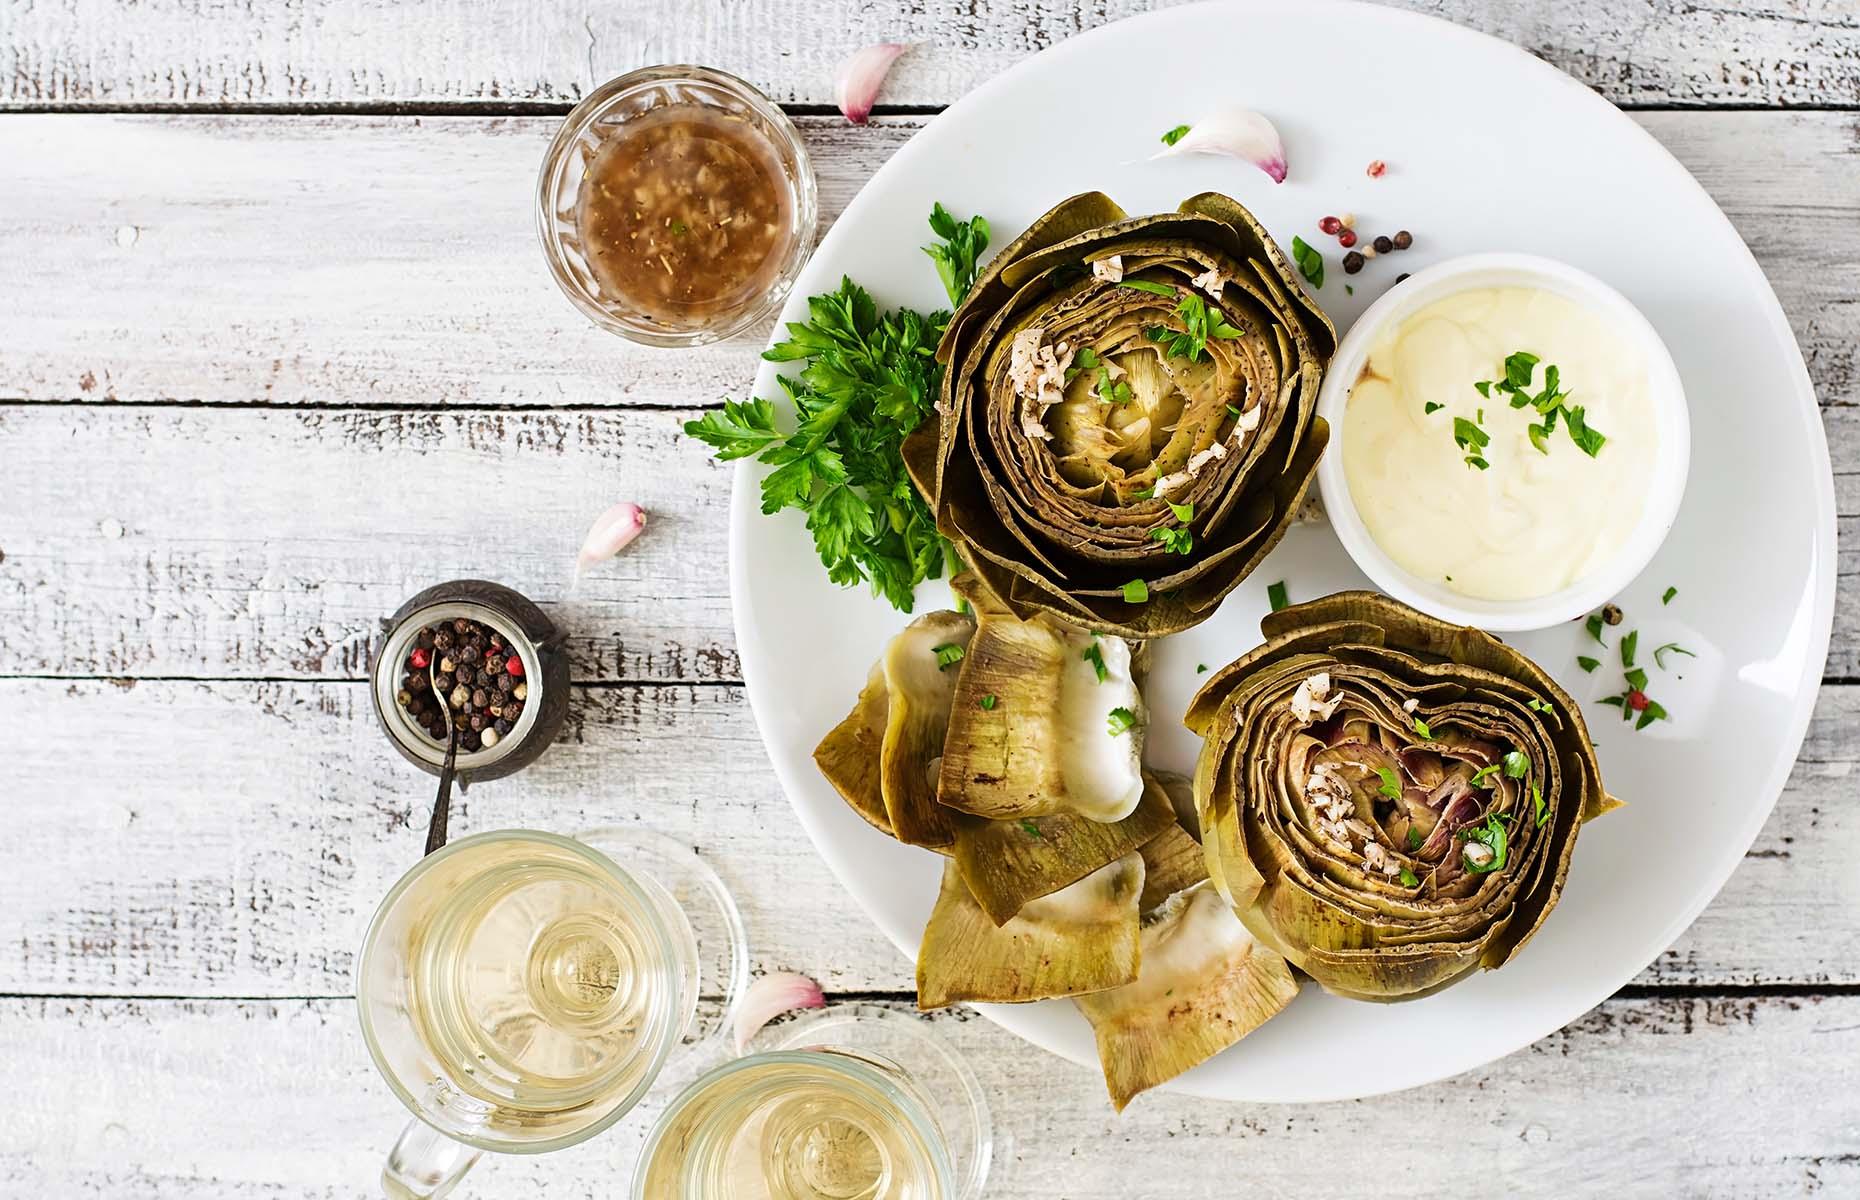 How to cook artichokes: whole artichoke